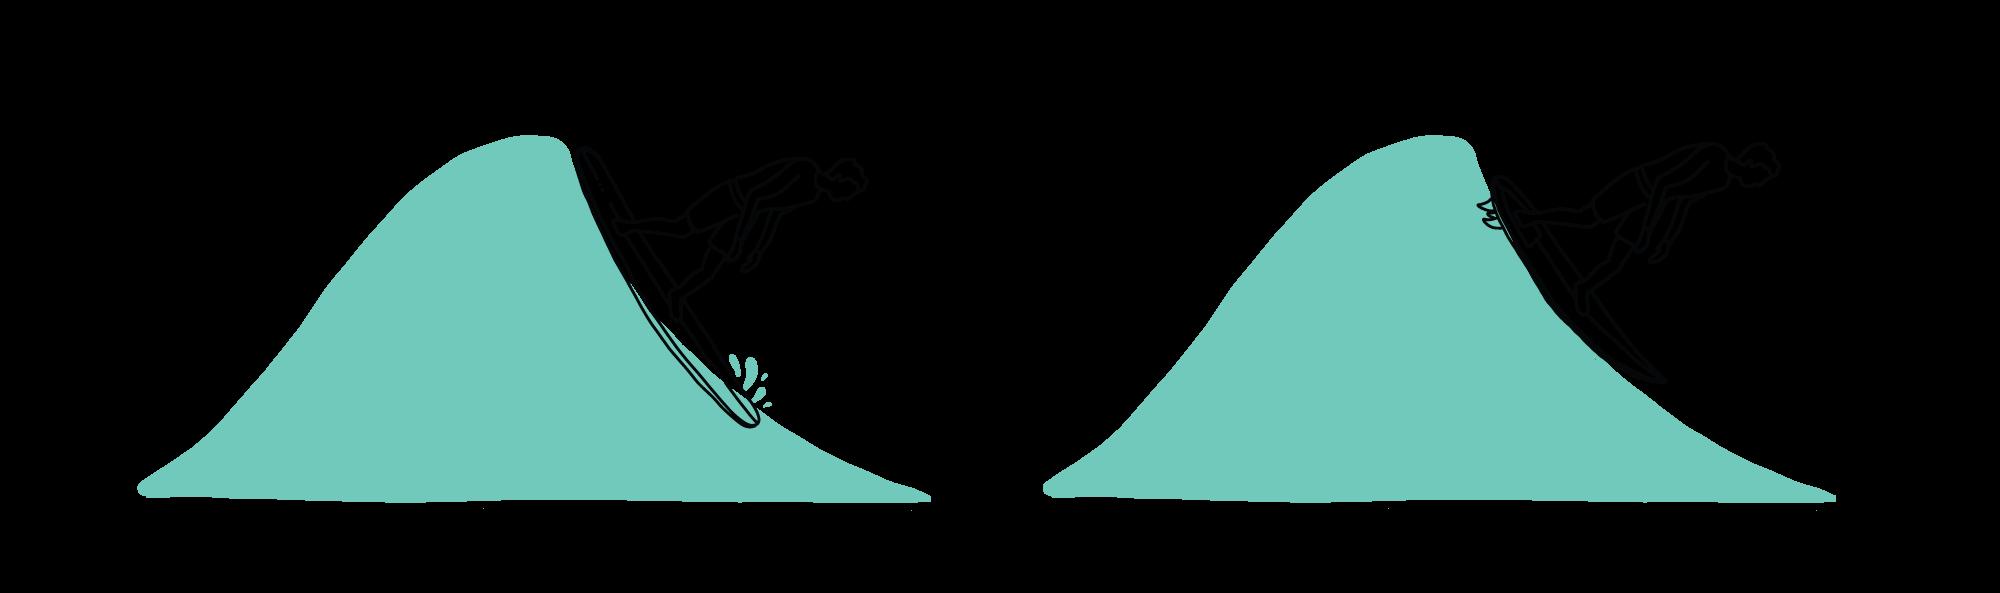 Understand The Surfboard S Rocker Surf Equipment Tips